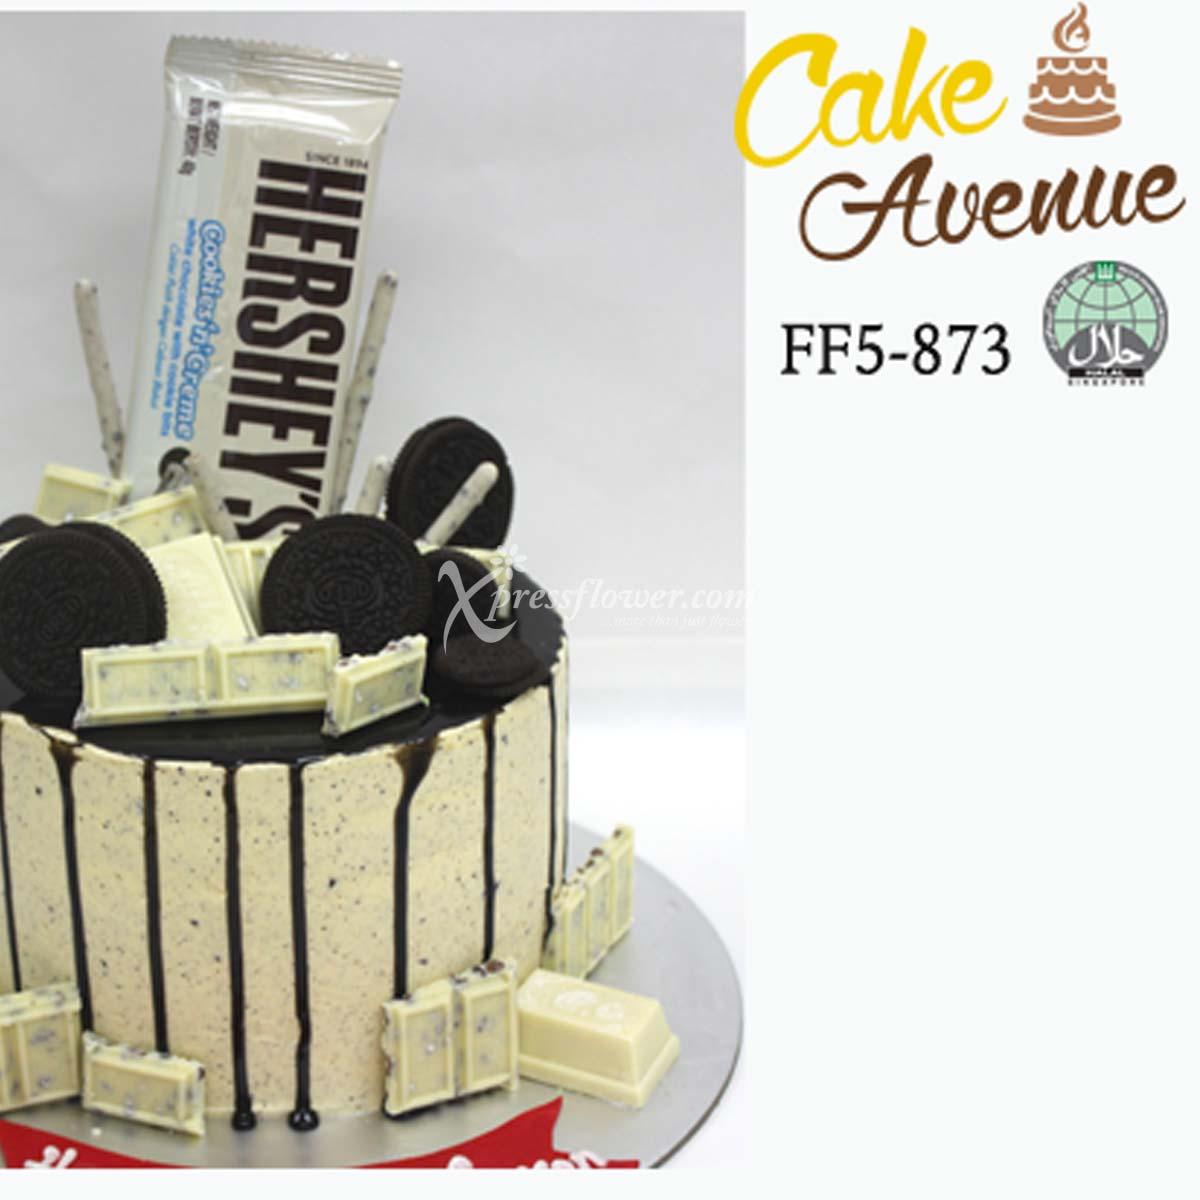 Hershey Craze (Cake Avenue)